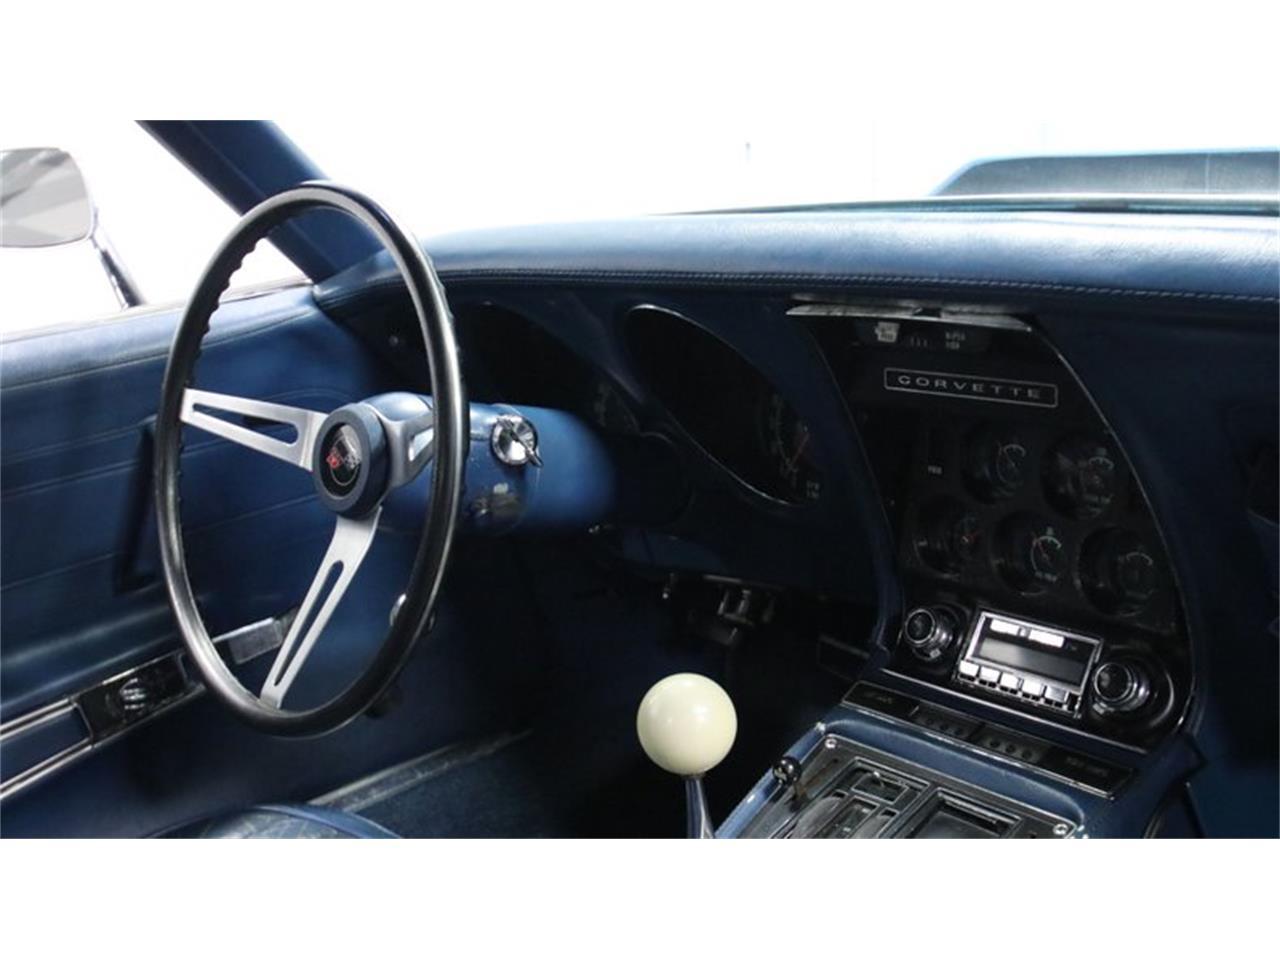 1971 Chevrolet Corvette (CC-1423576) for sale in Lithia Springs, Georgia